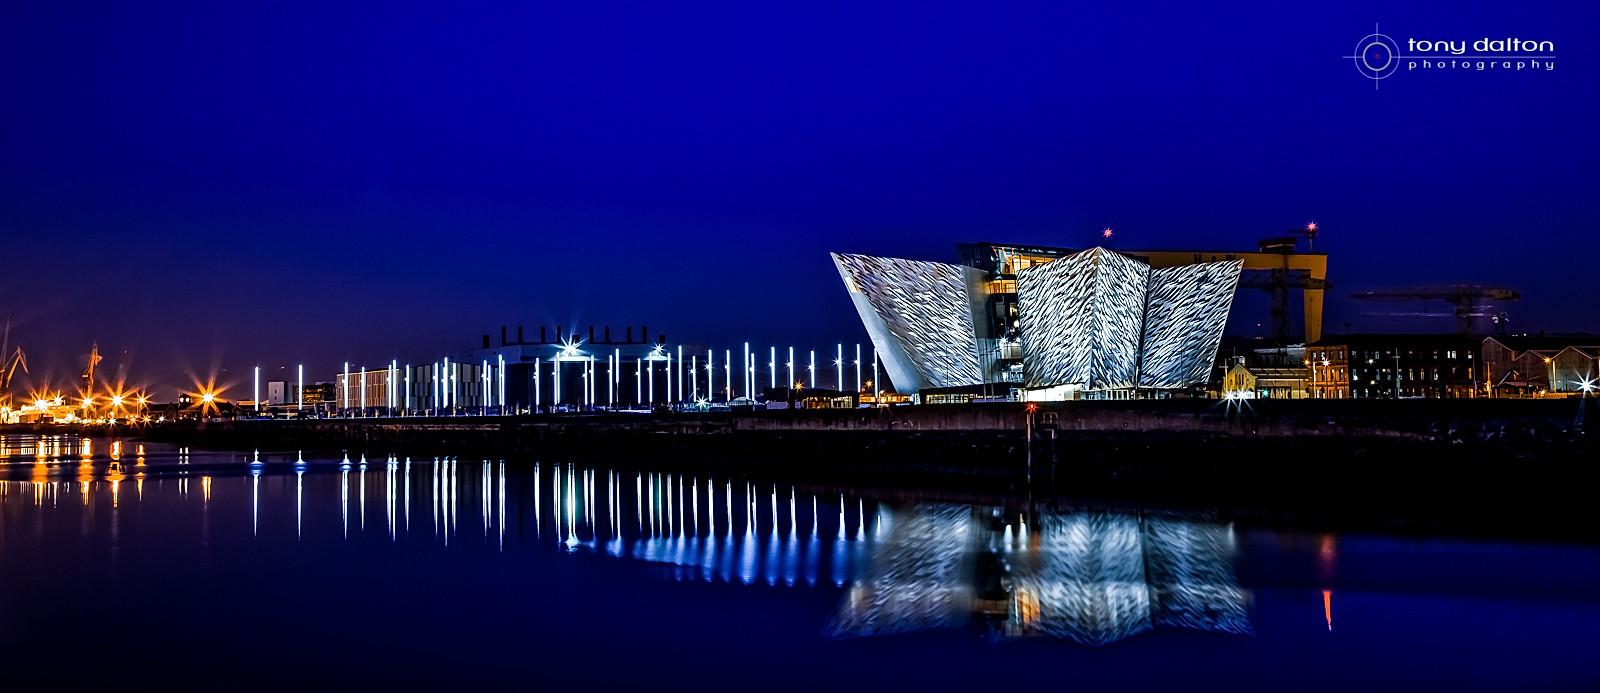 Titanic Visitor Centre